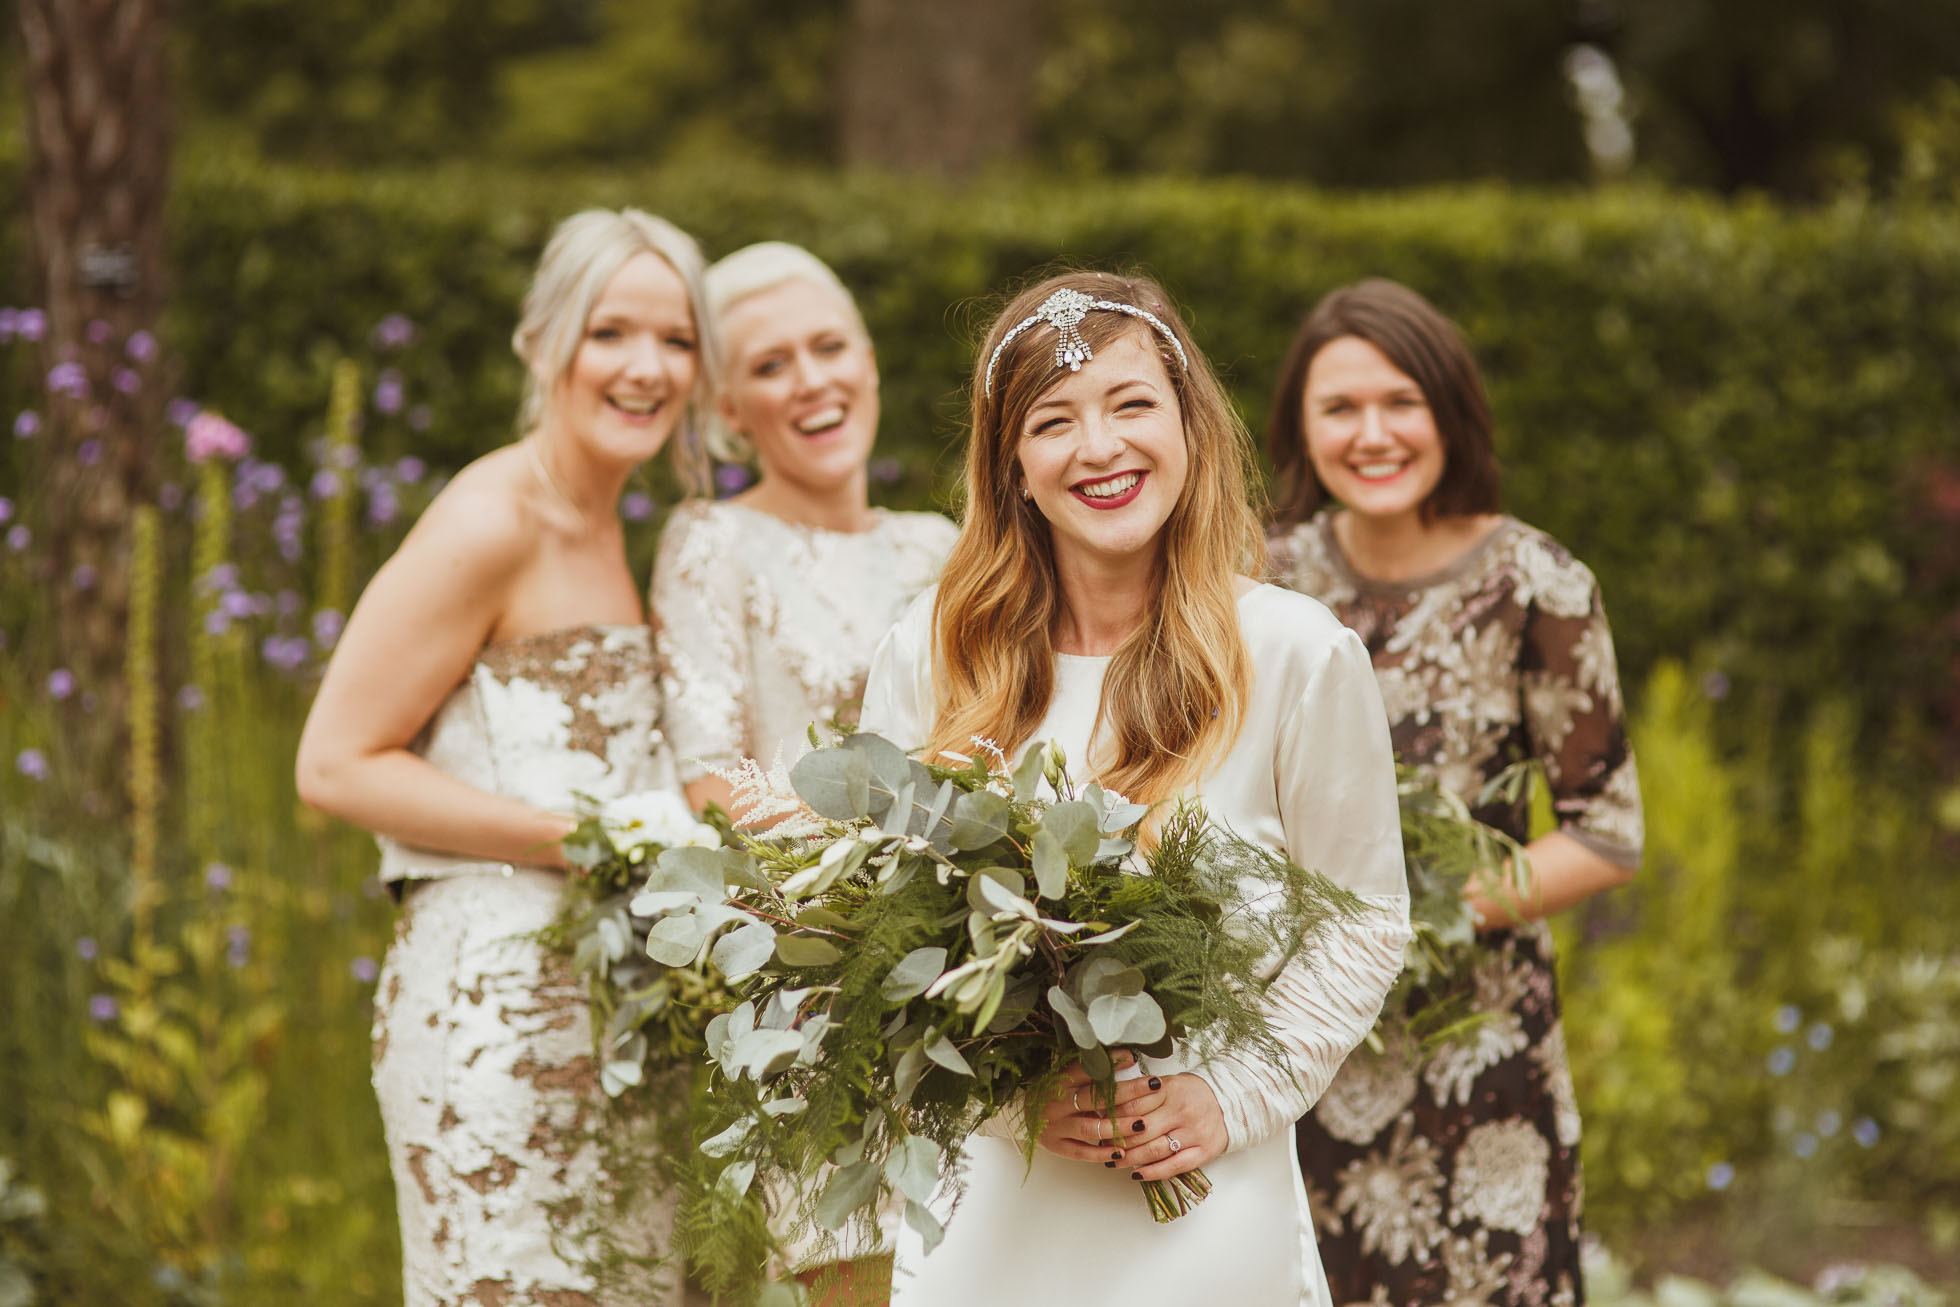 sheffield-botanical-gardens-wedding-photographer-34.jpg